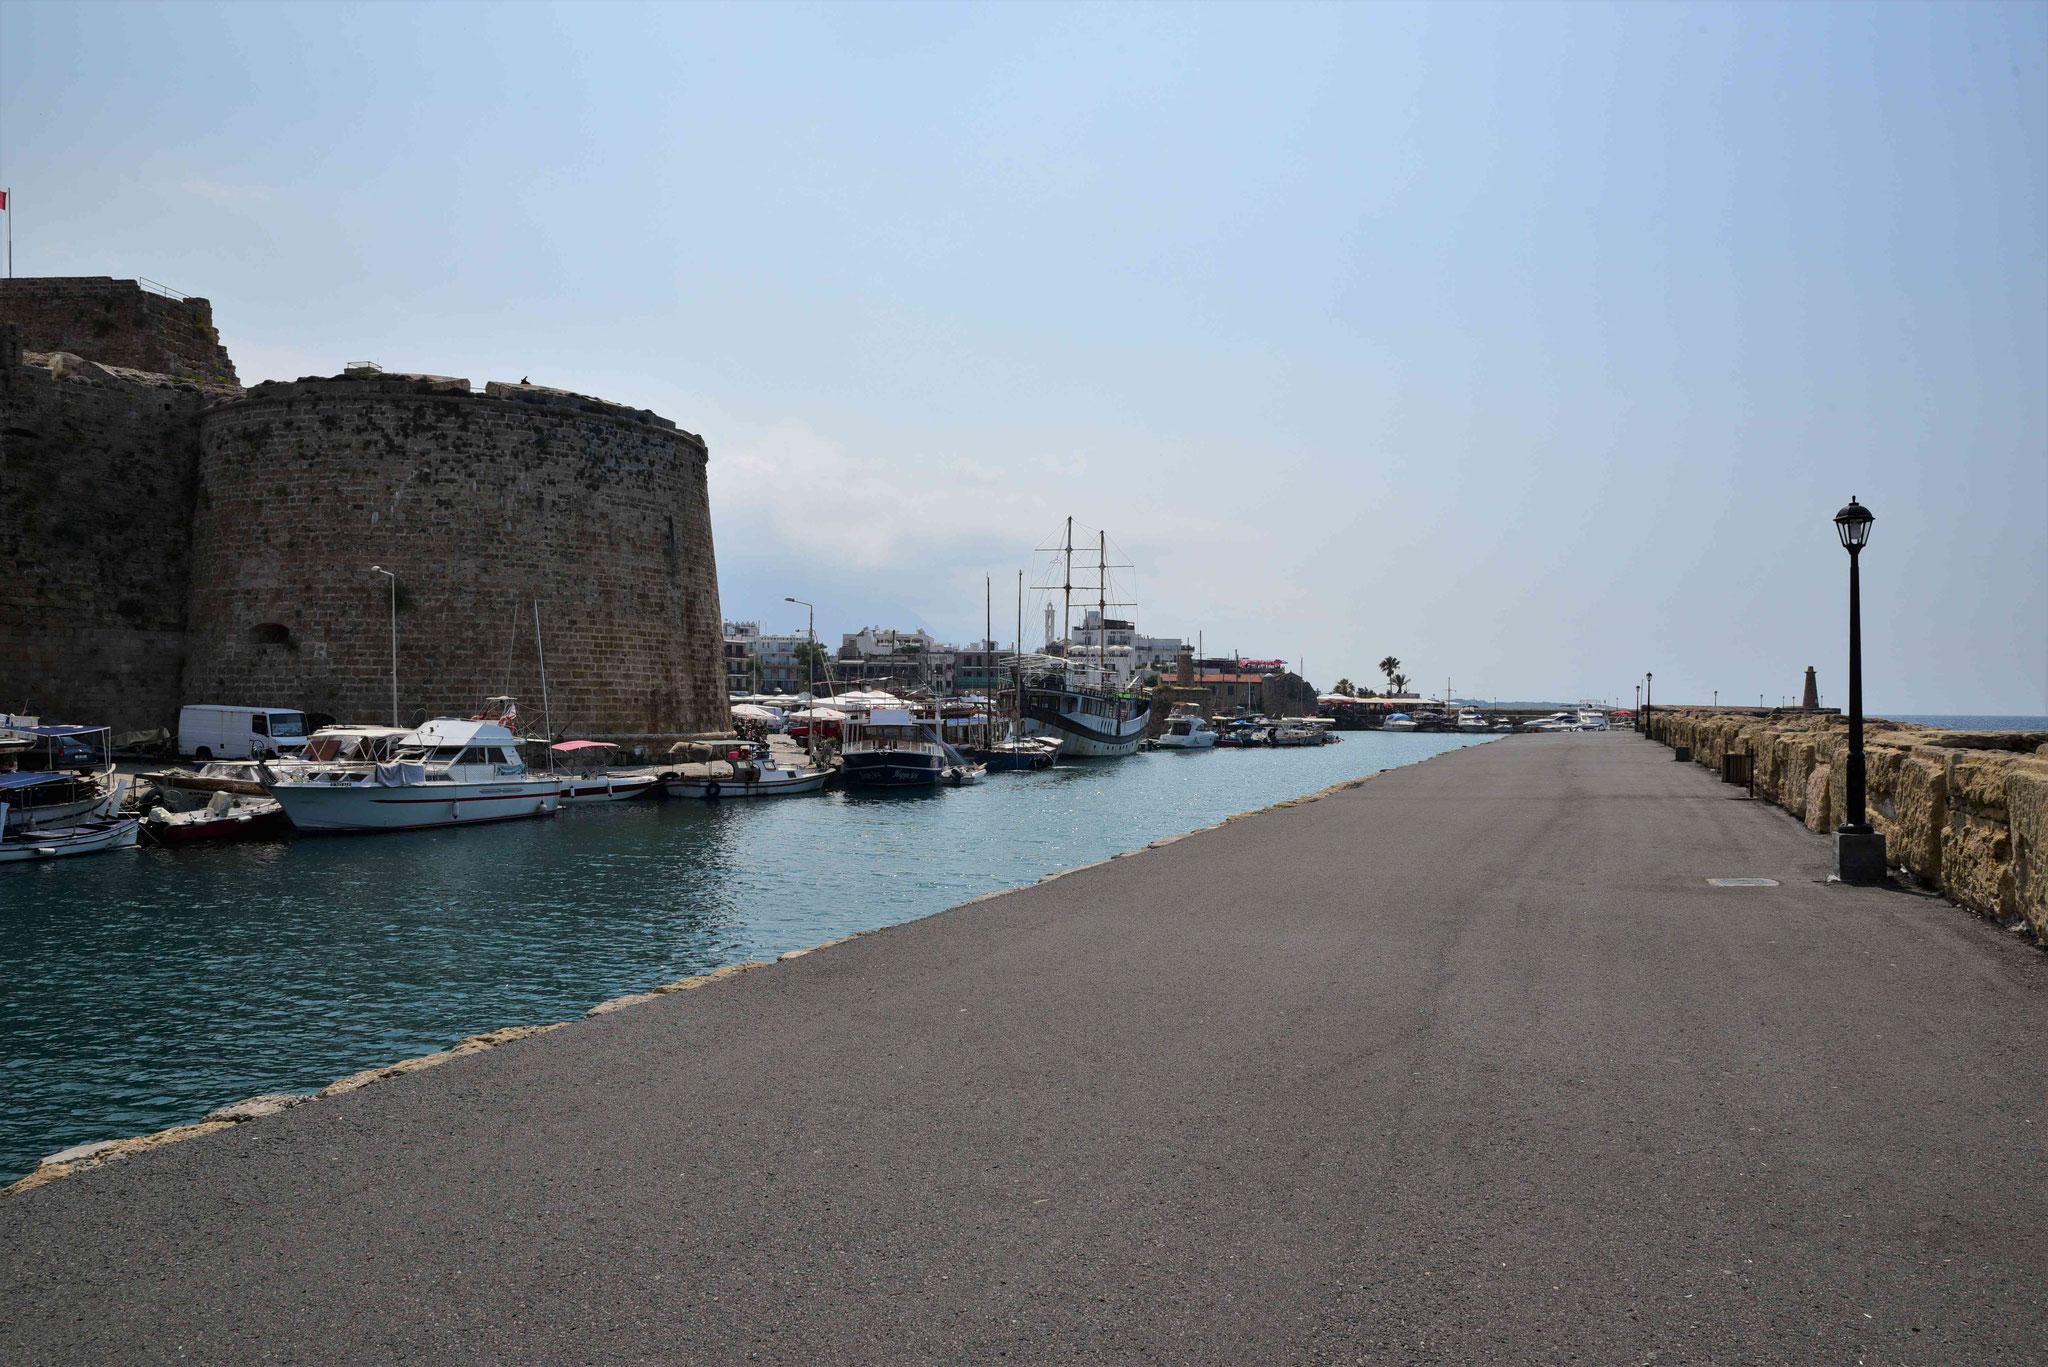 Ausgebaute Hafenpromenade